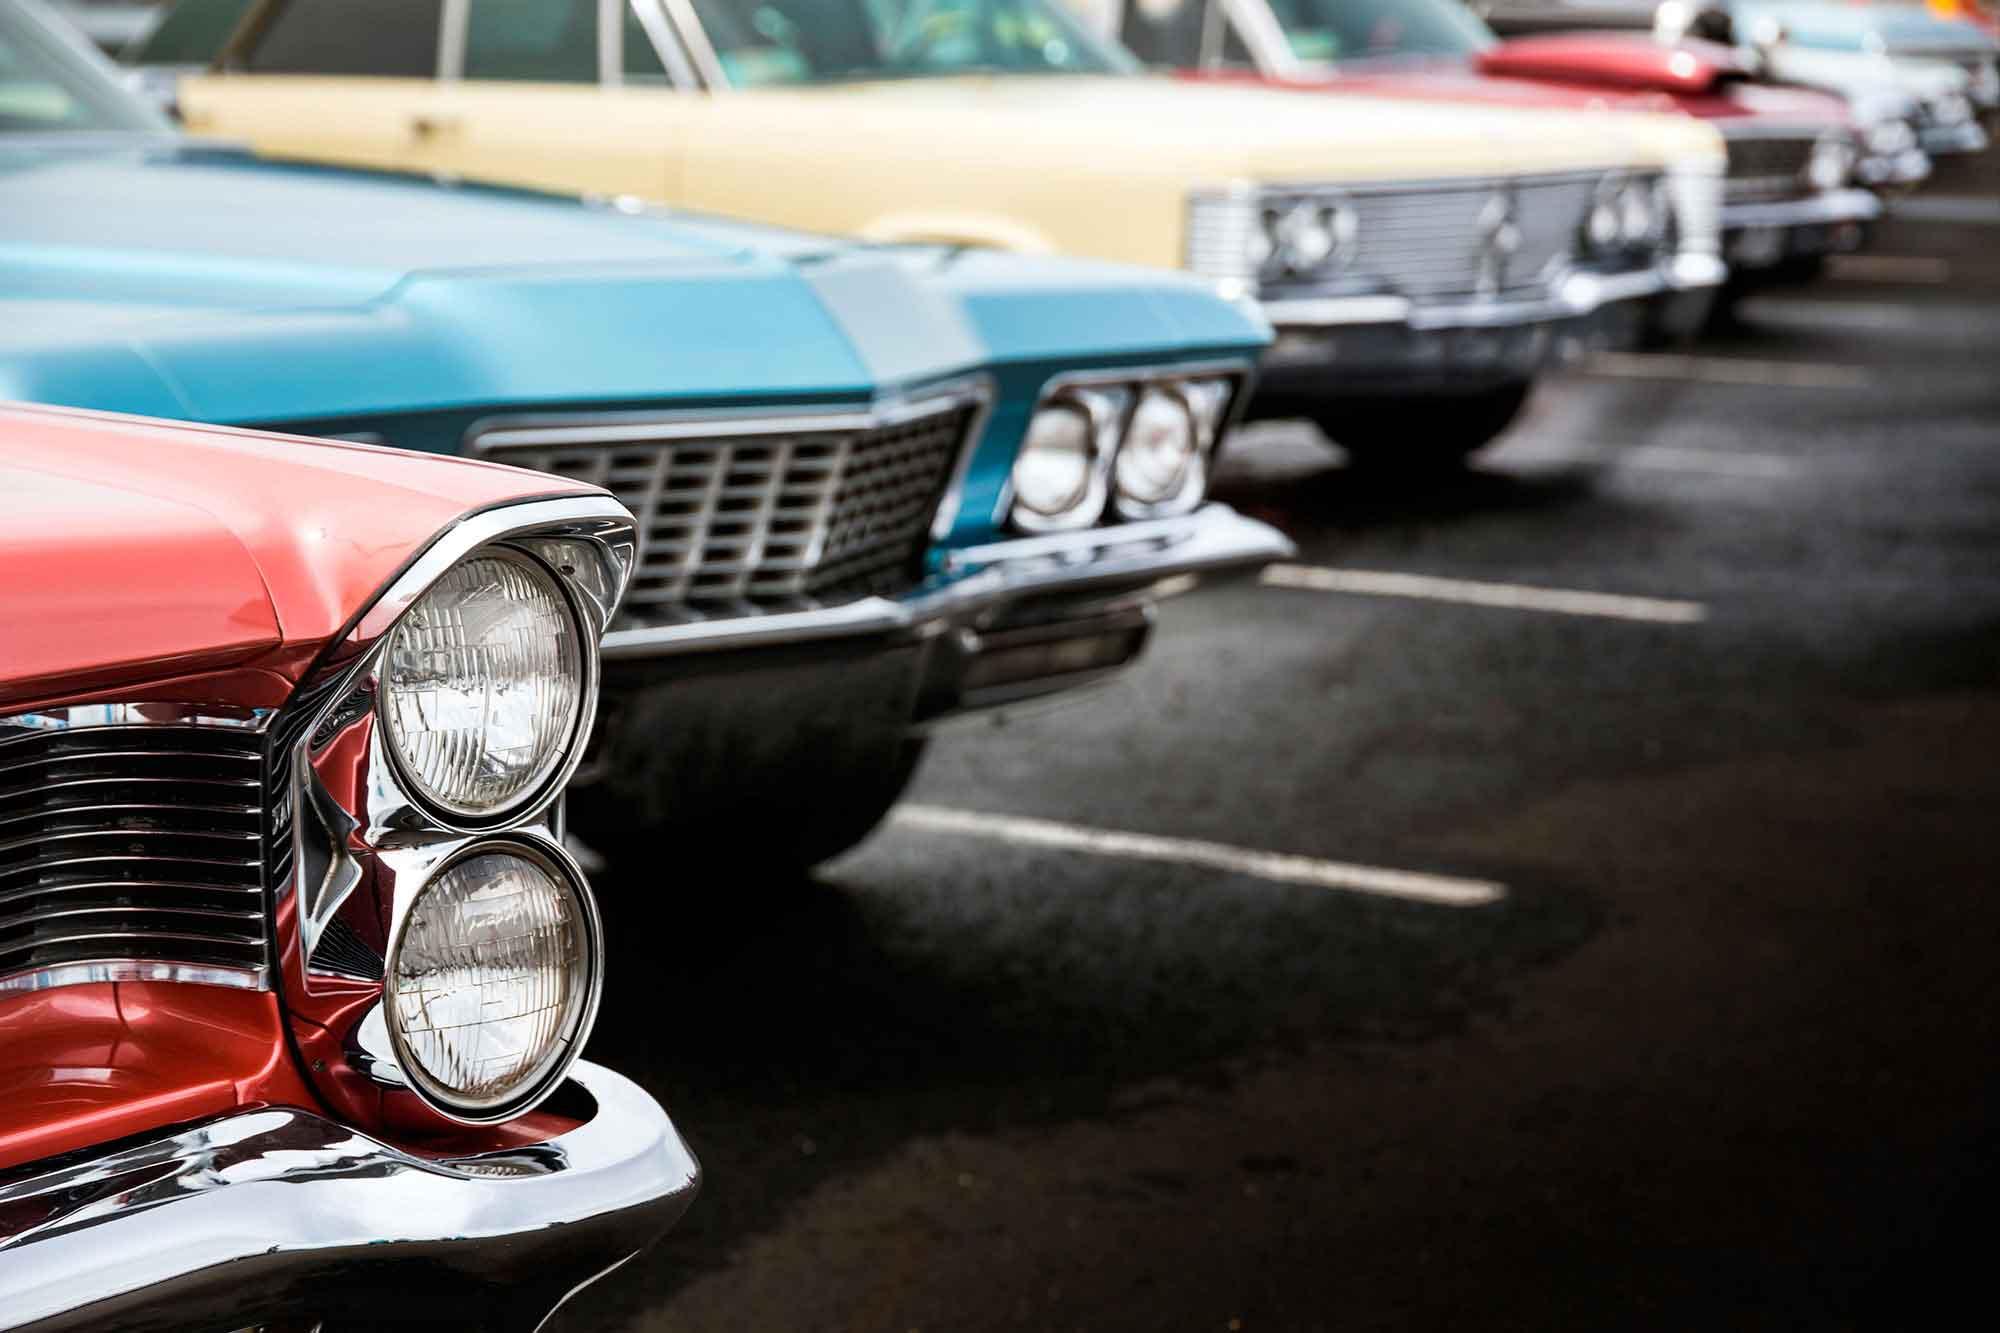 Jeffreys Auto Resale Inc - Used Cars - Roseville MI Dealer